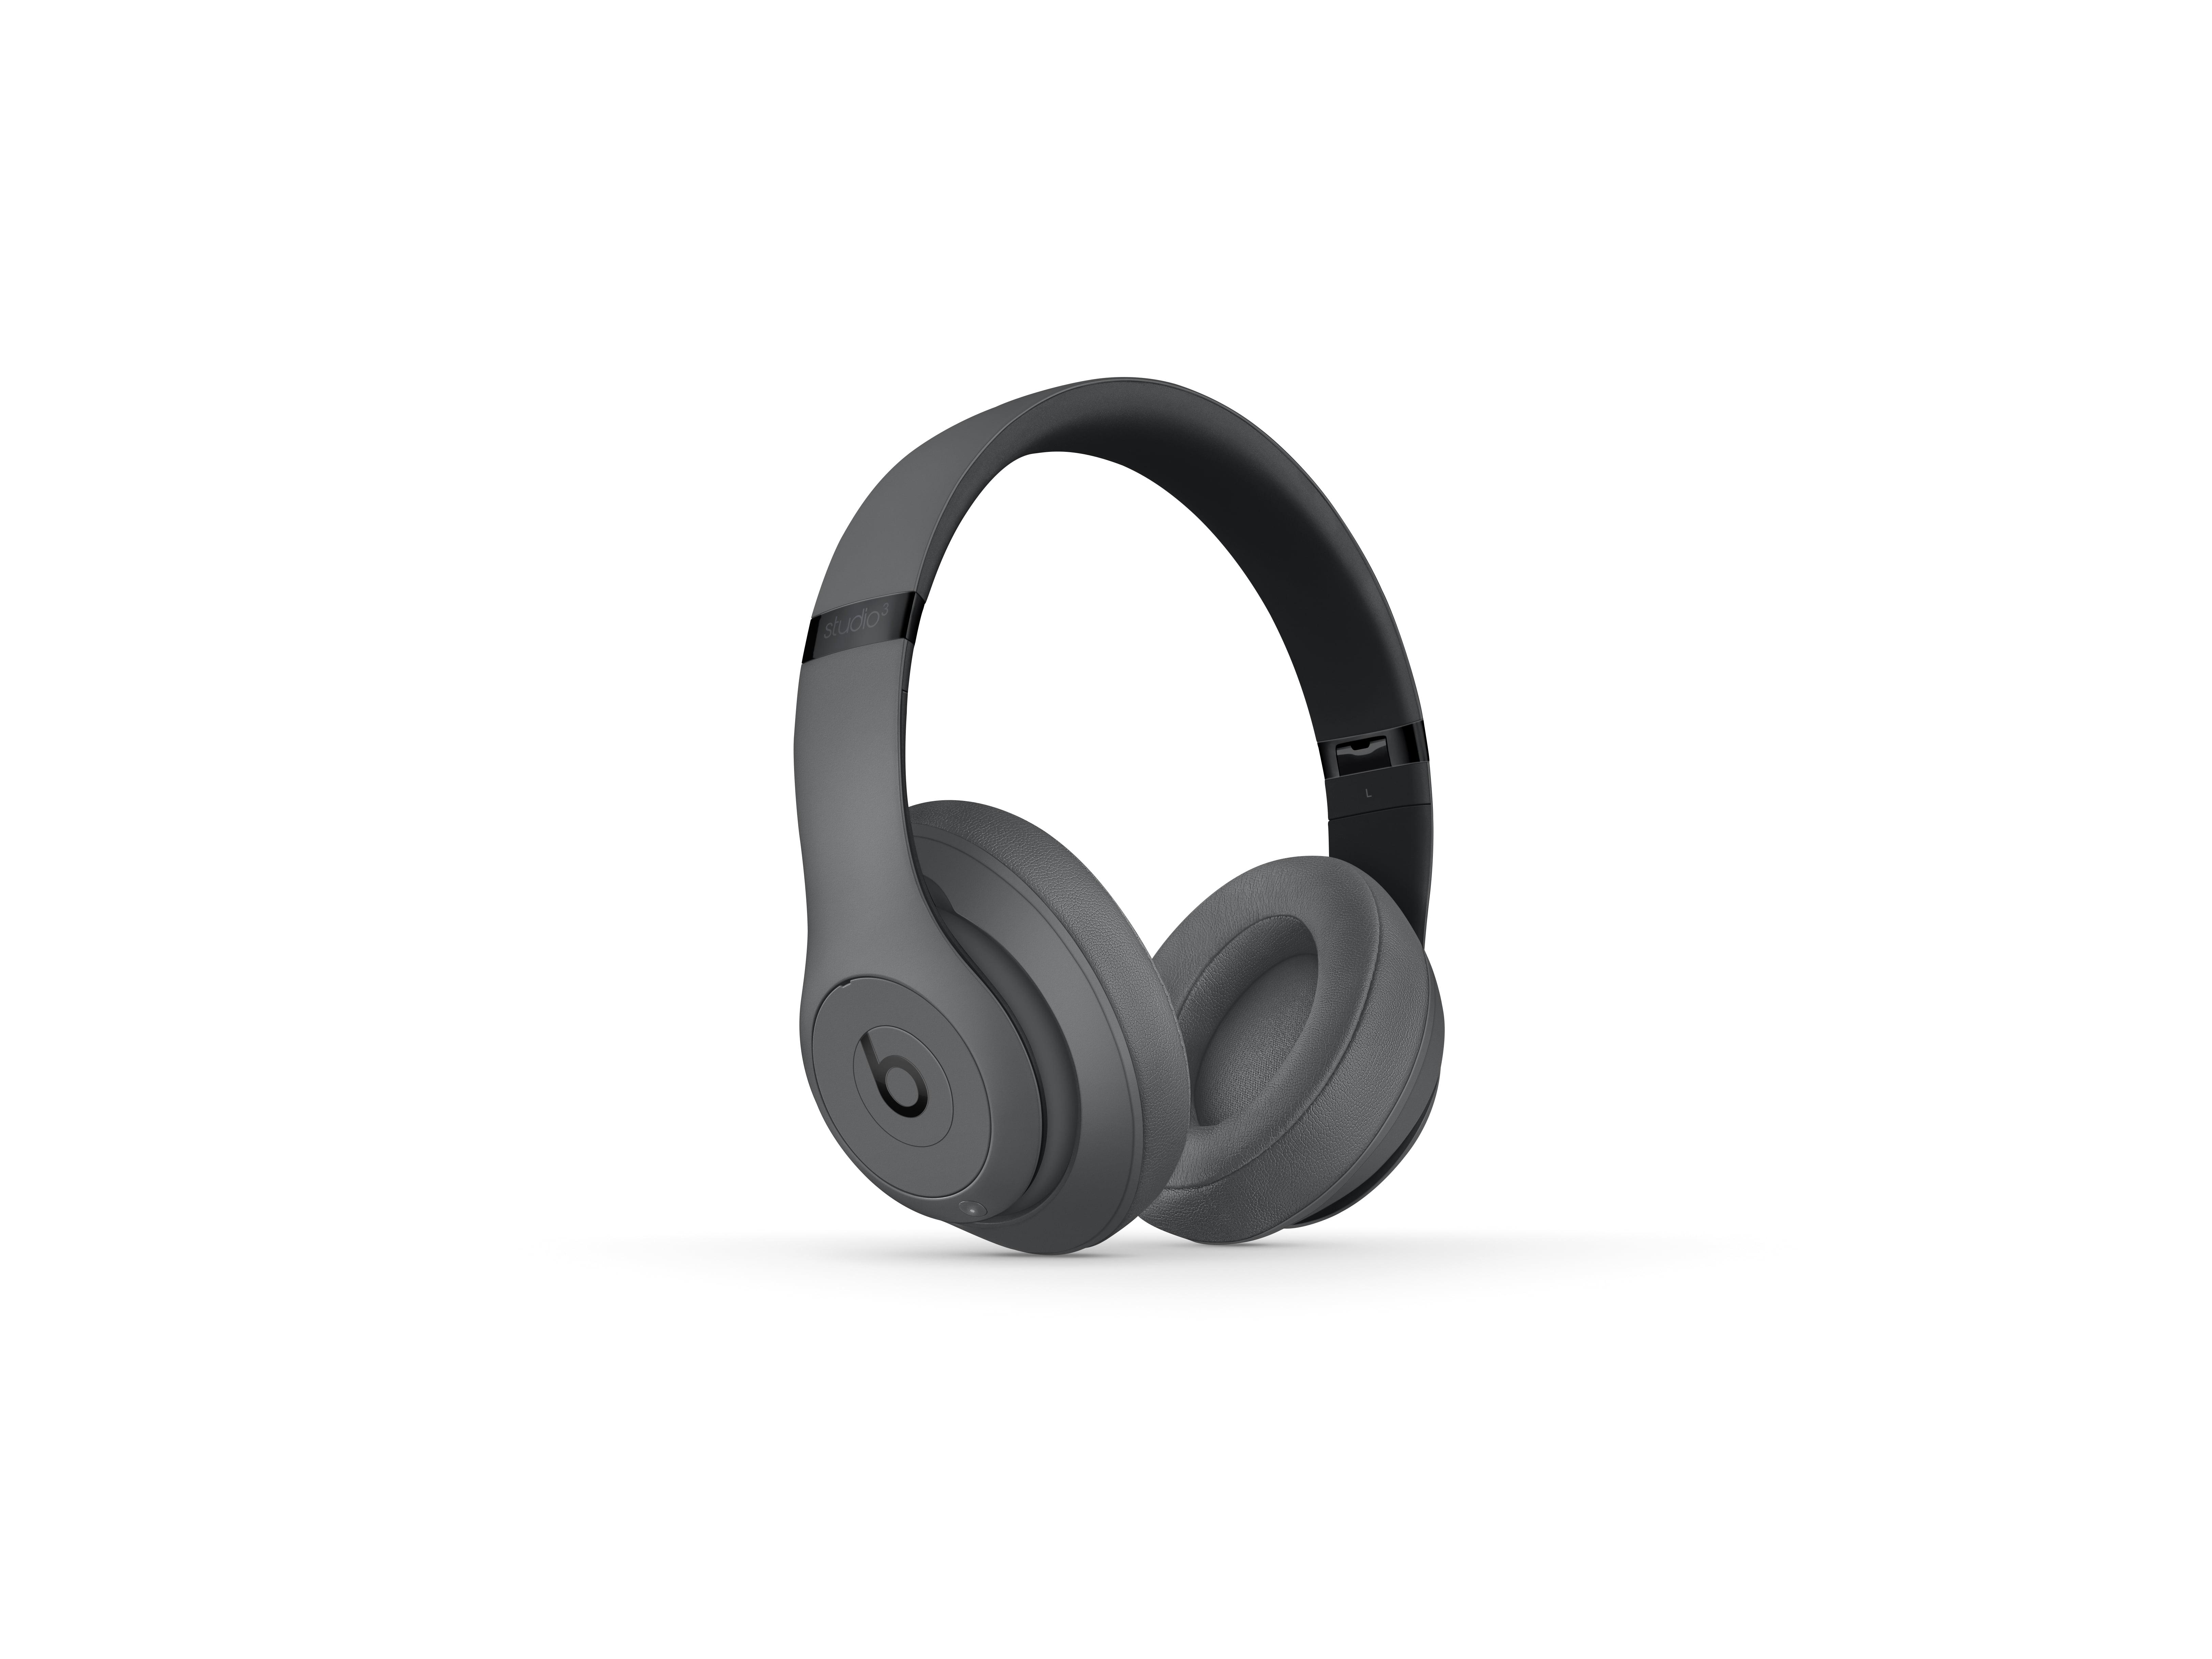 9b62a711906 Beats Studio3 Wireless Over-Ear Headphones - Walmart.com